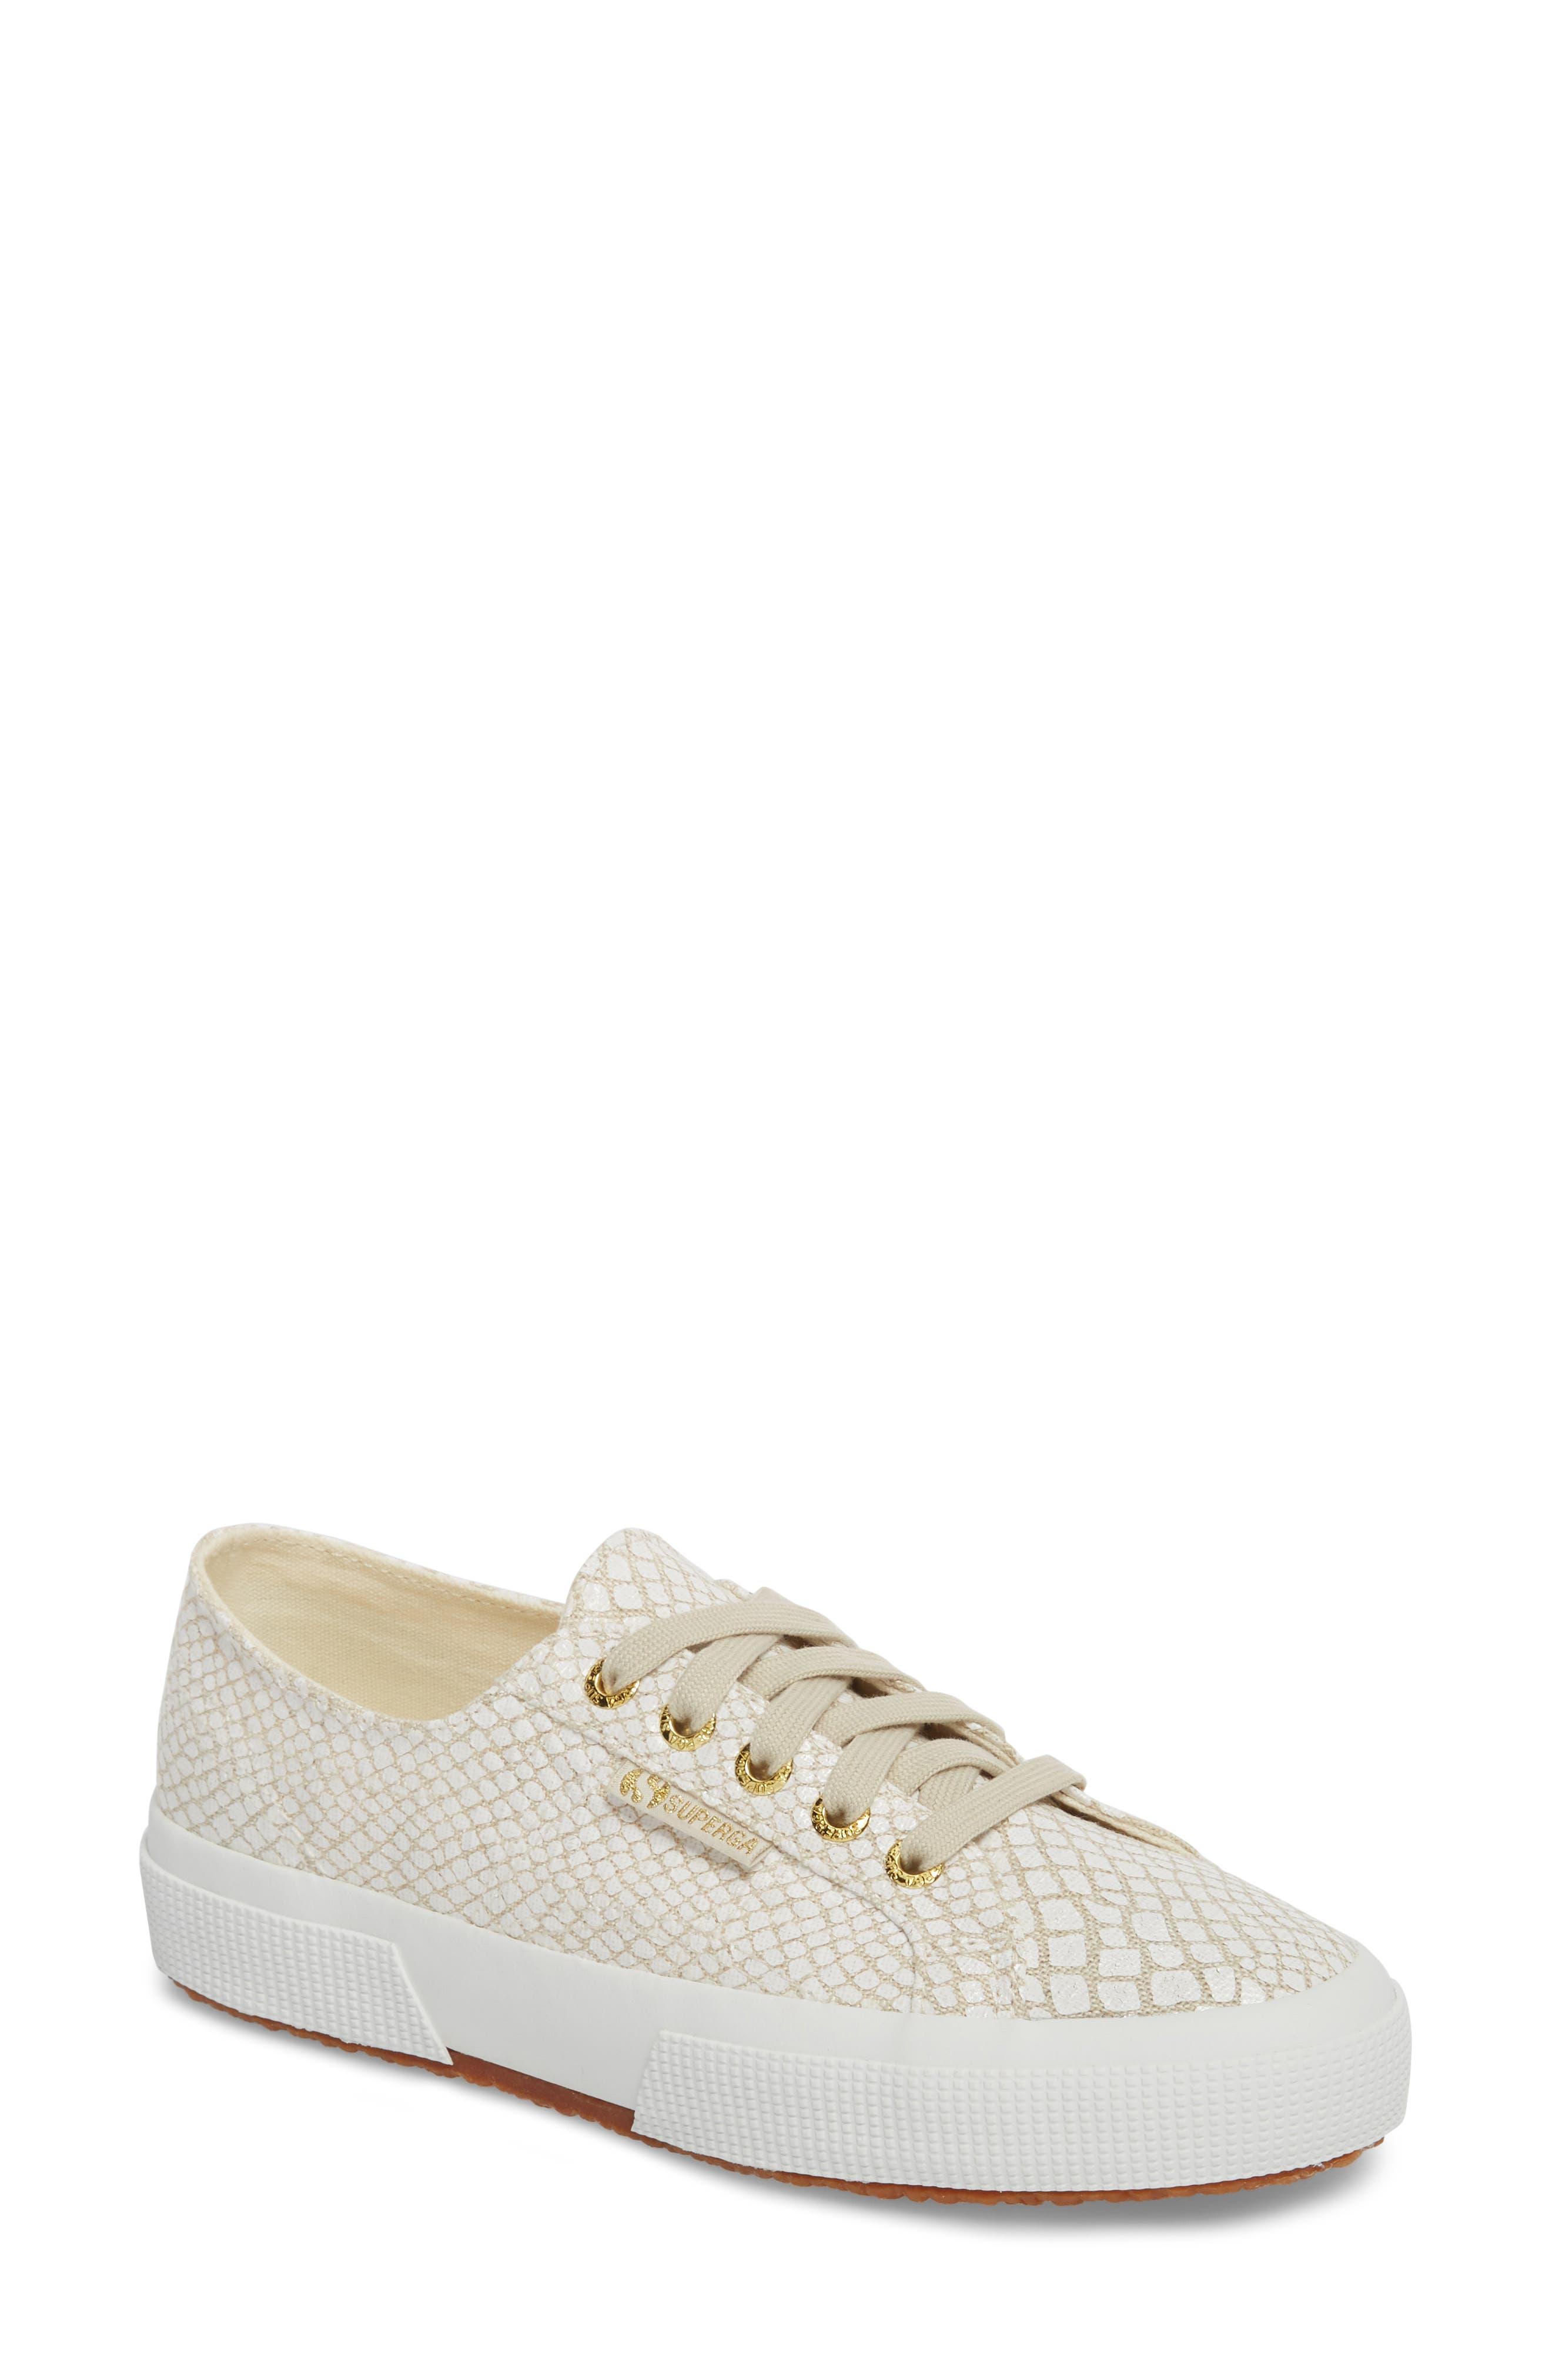 Sneaker SUPERGA 2750 Plus Satin Violet SILVER